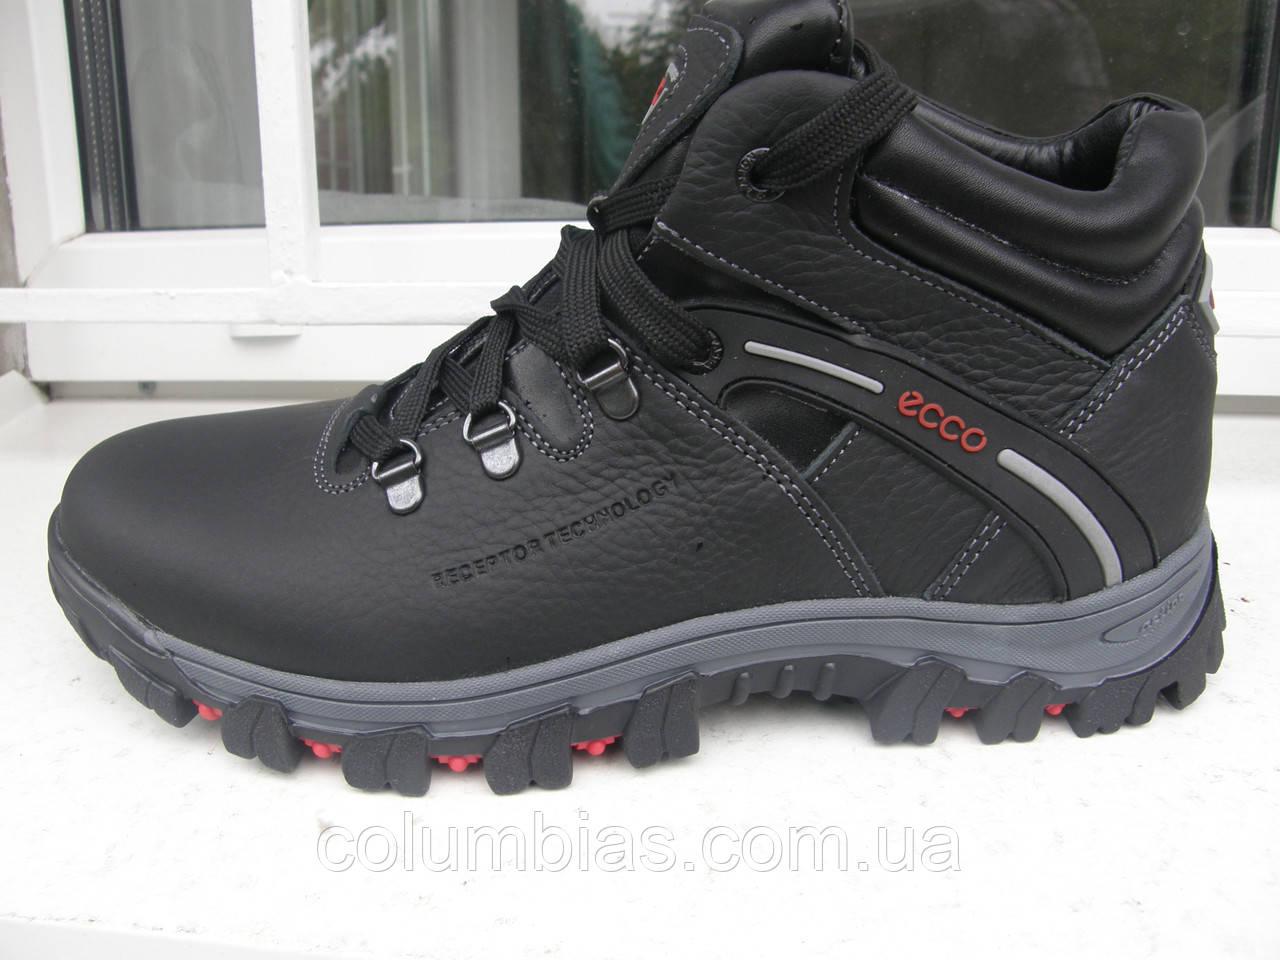 d47e09b2 Обувь зимняя мужская Ecco н89: продажа, цена в Днепропетровской ...